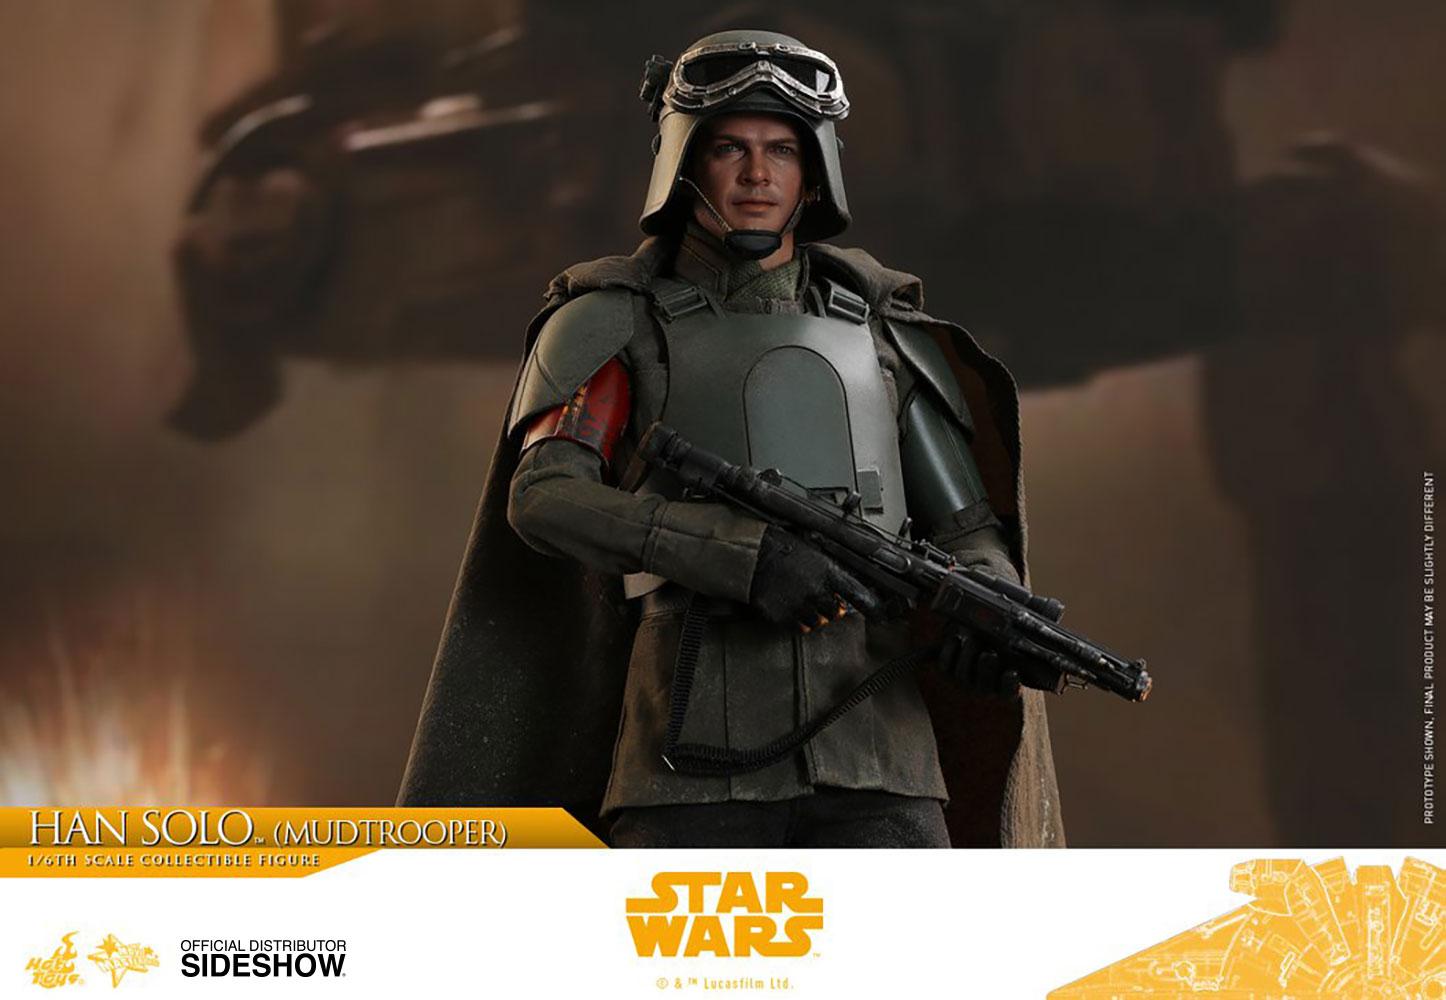 Han-solo-mudtrooper-sixth-scale-figure-02